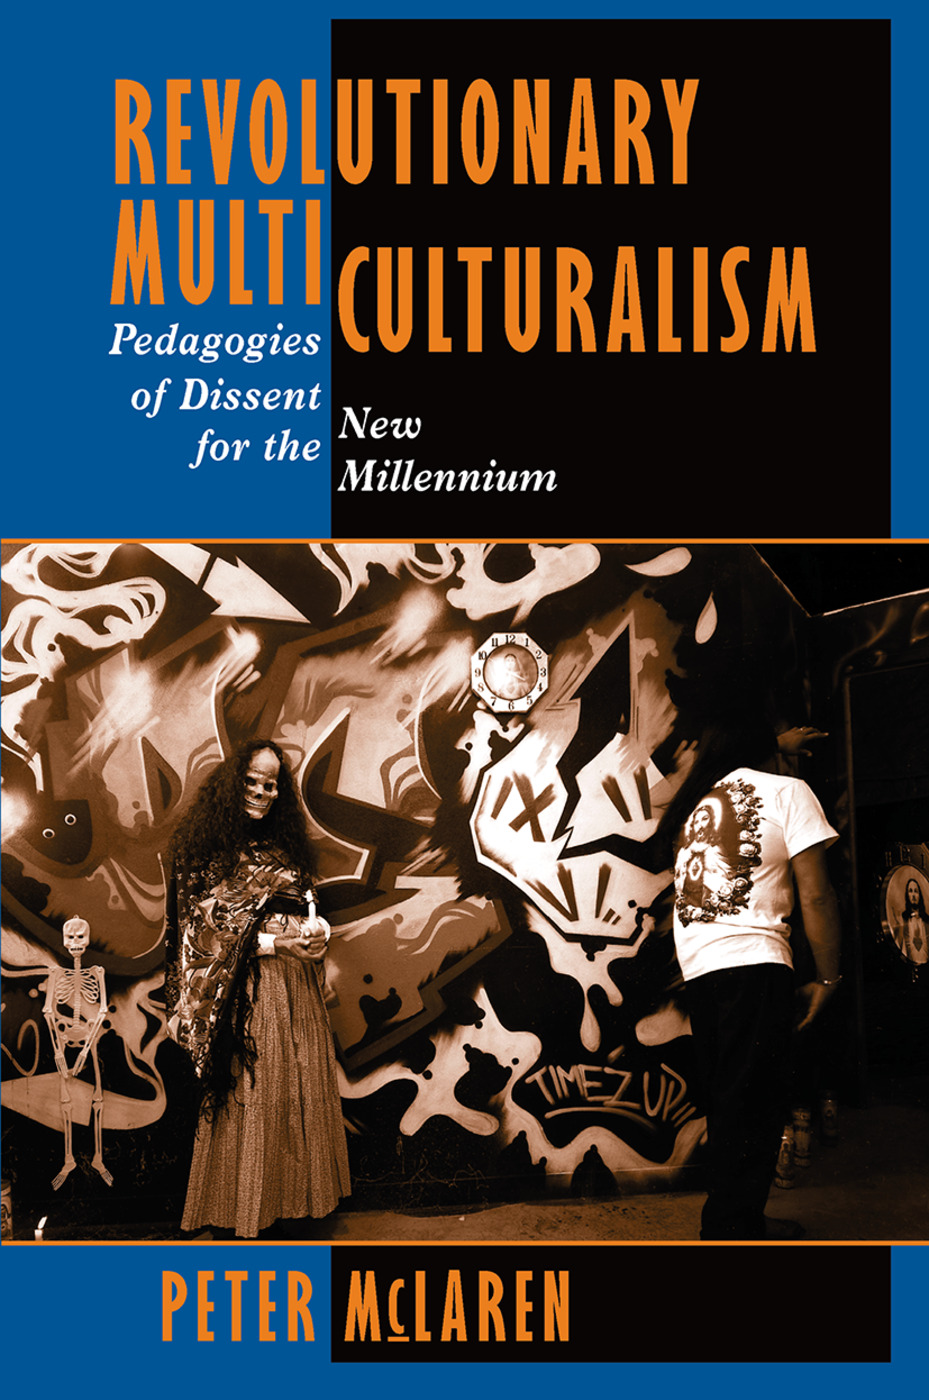 Revolutionary Multiculturalism: Pedagogies Of Dissent For The New Millennium book cover